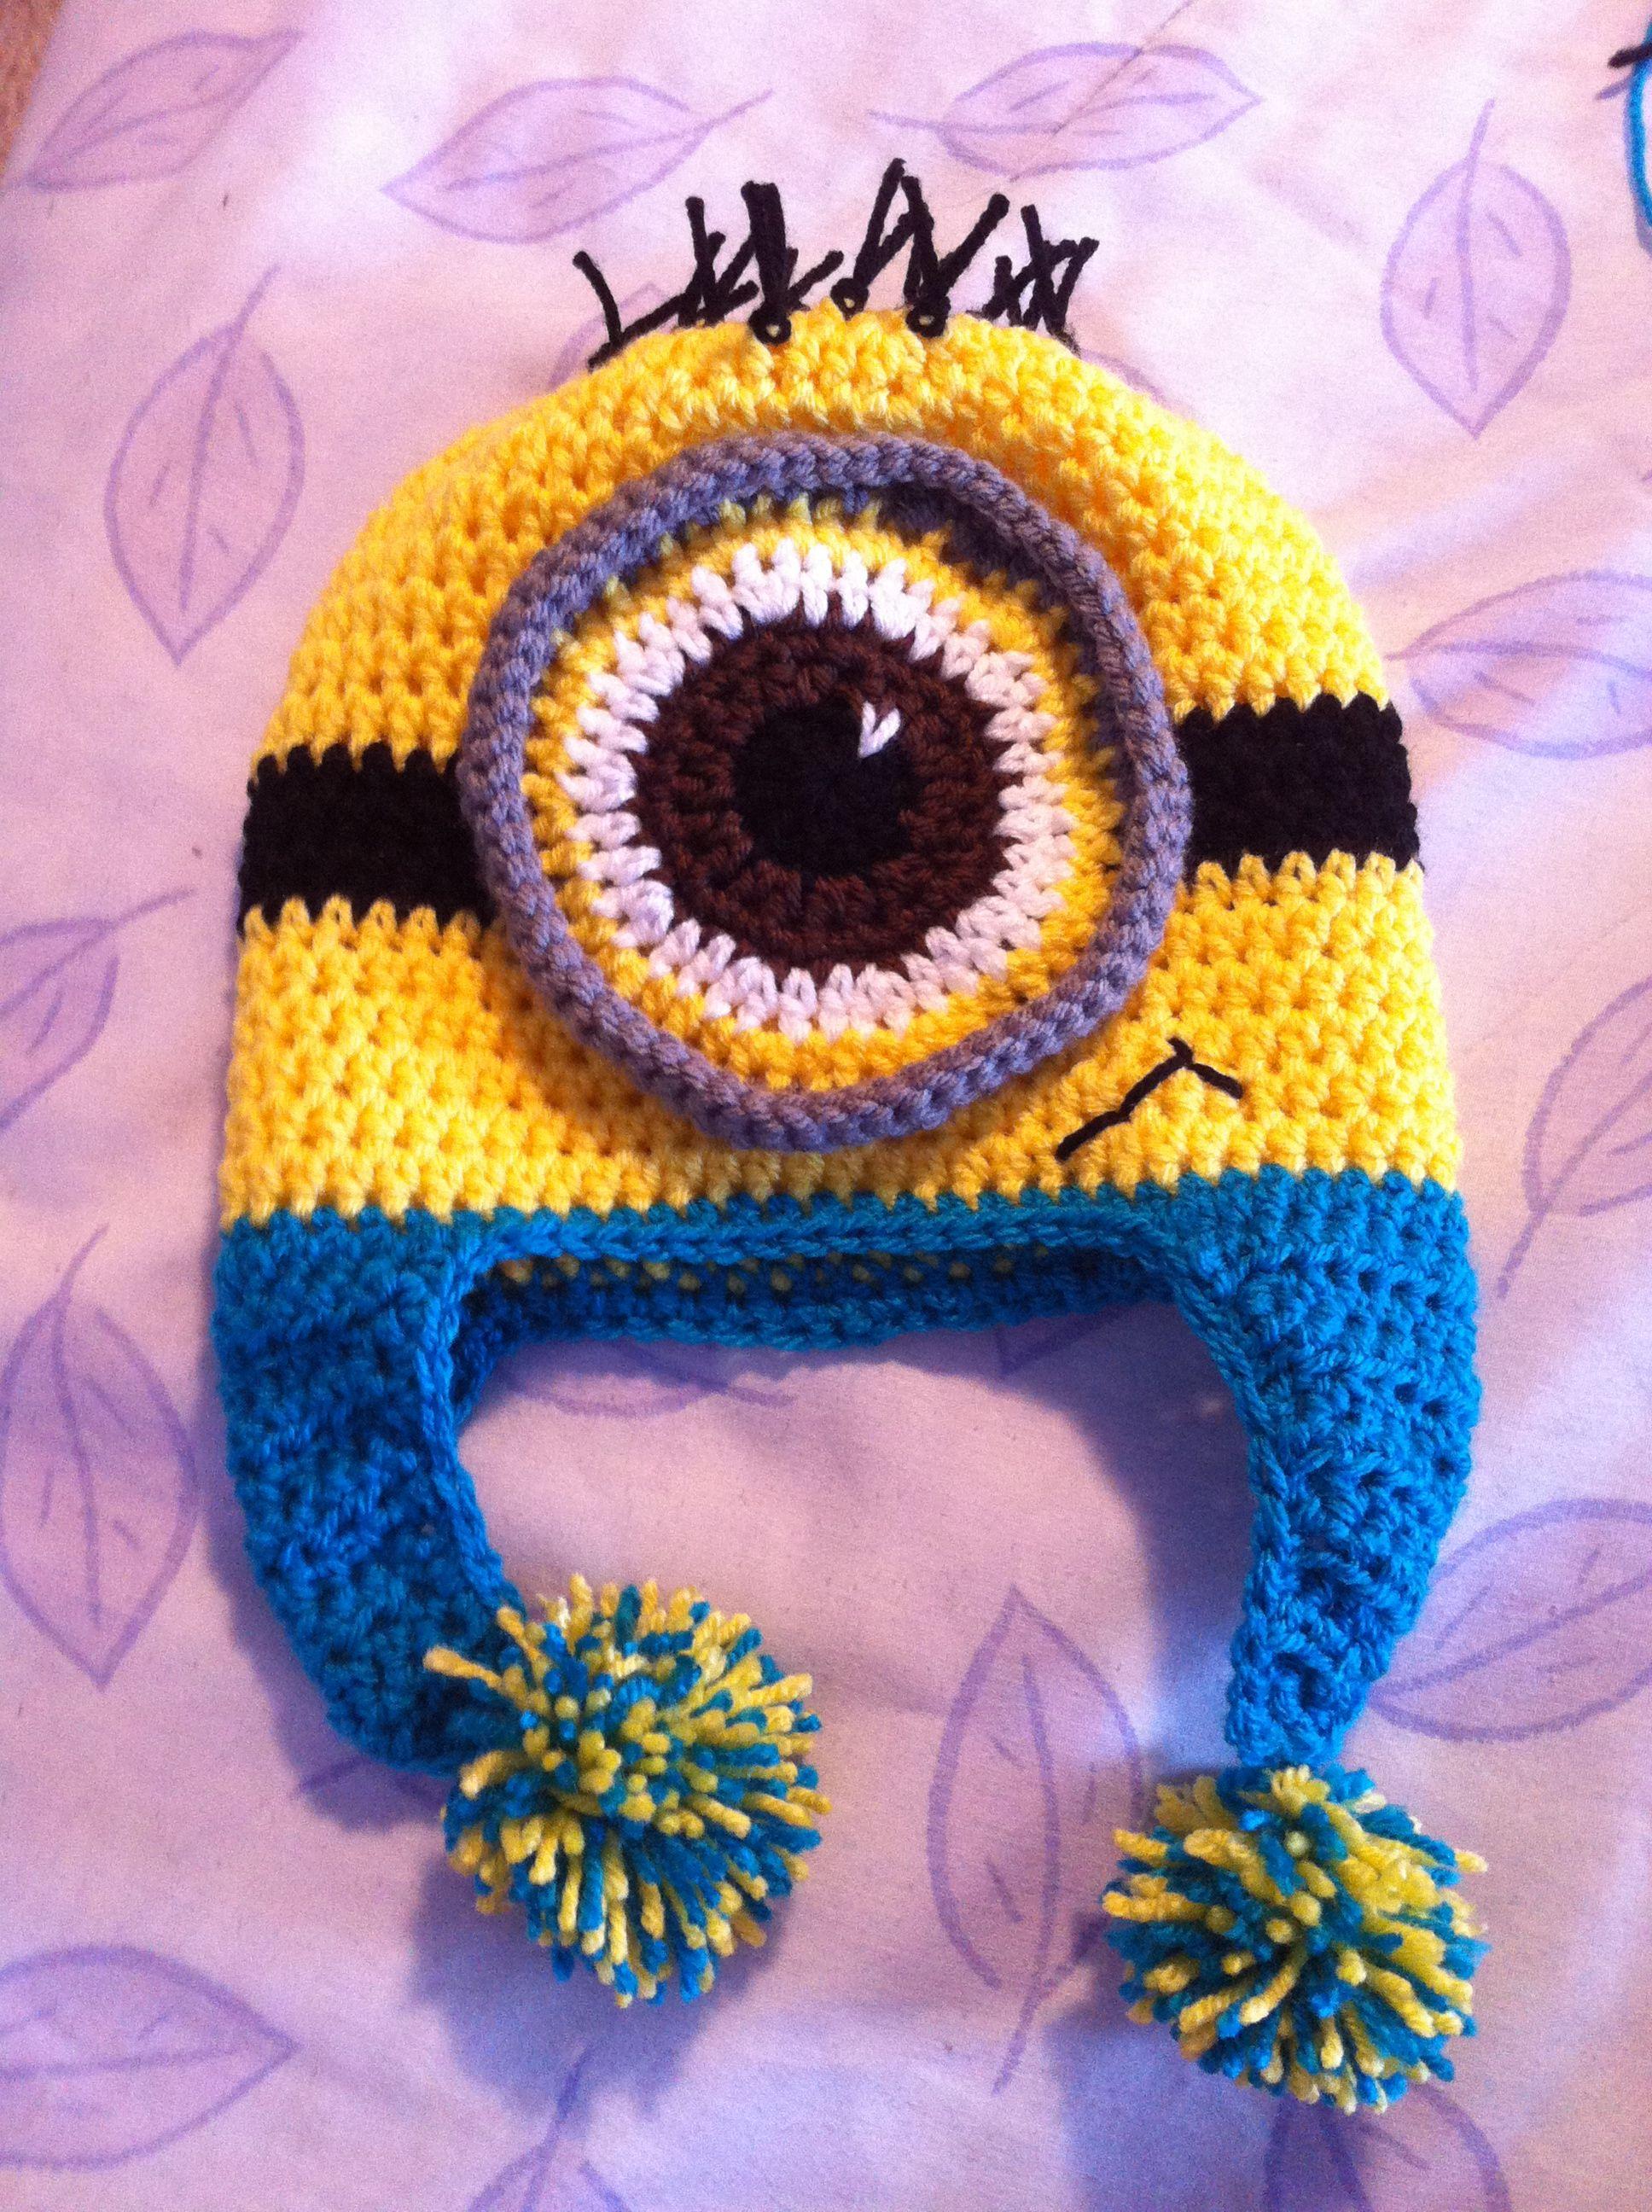 One eyed Minion with Pom poms Crochet hat pattern